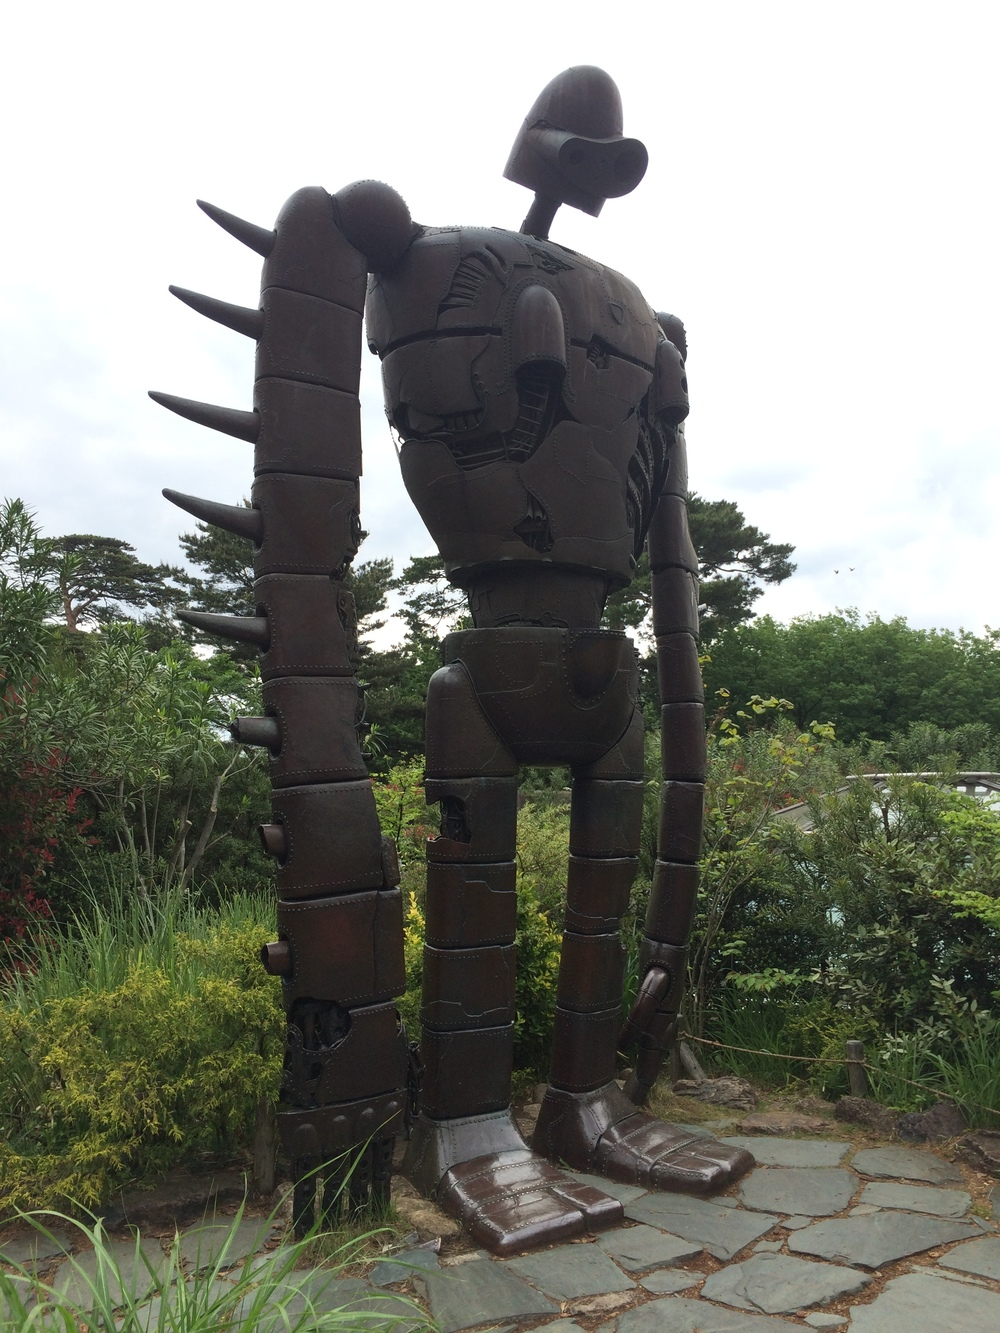 Laputa Robot Statue on Studio Ghibli Museum Rooftop